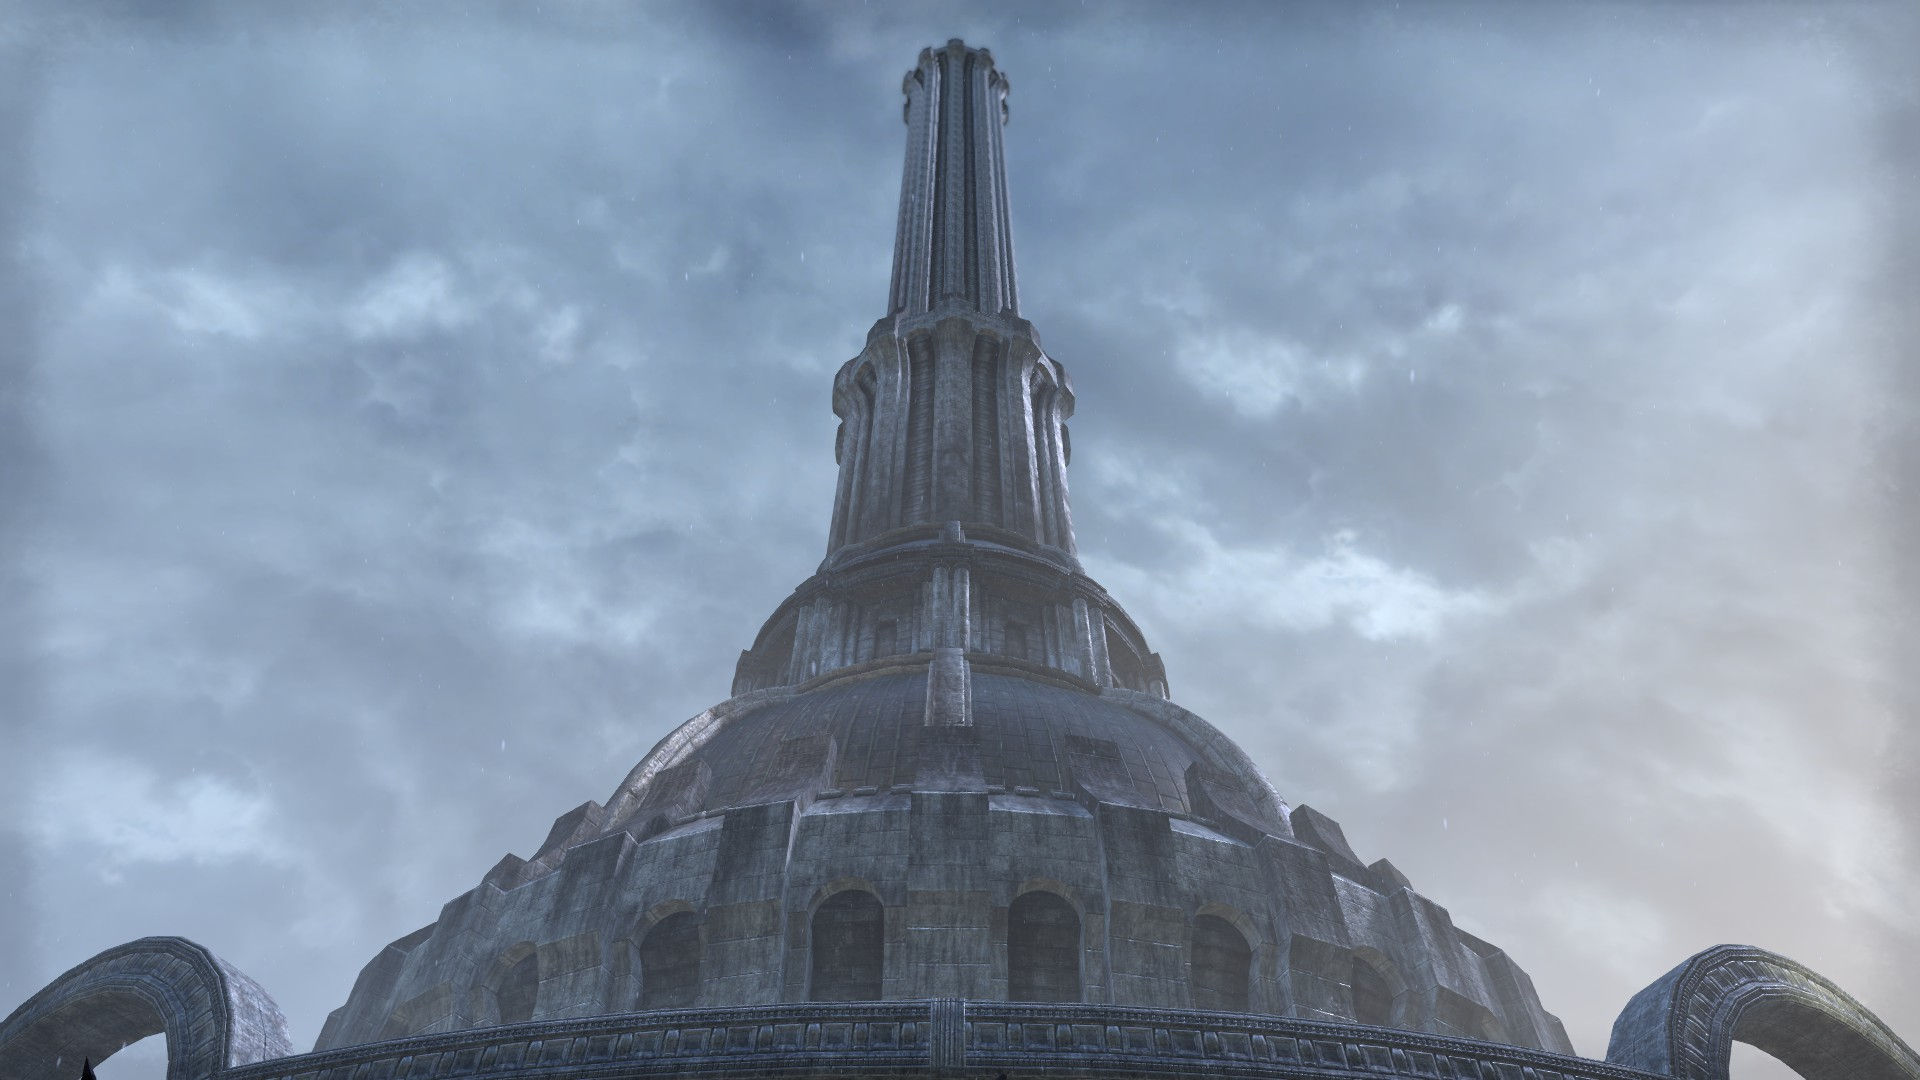 Daedric Armor White-Gold Tower (Onli...